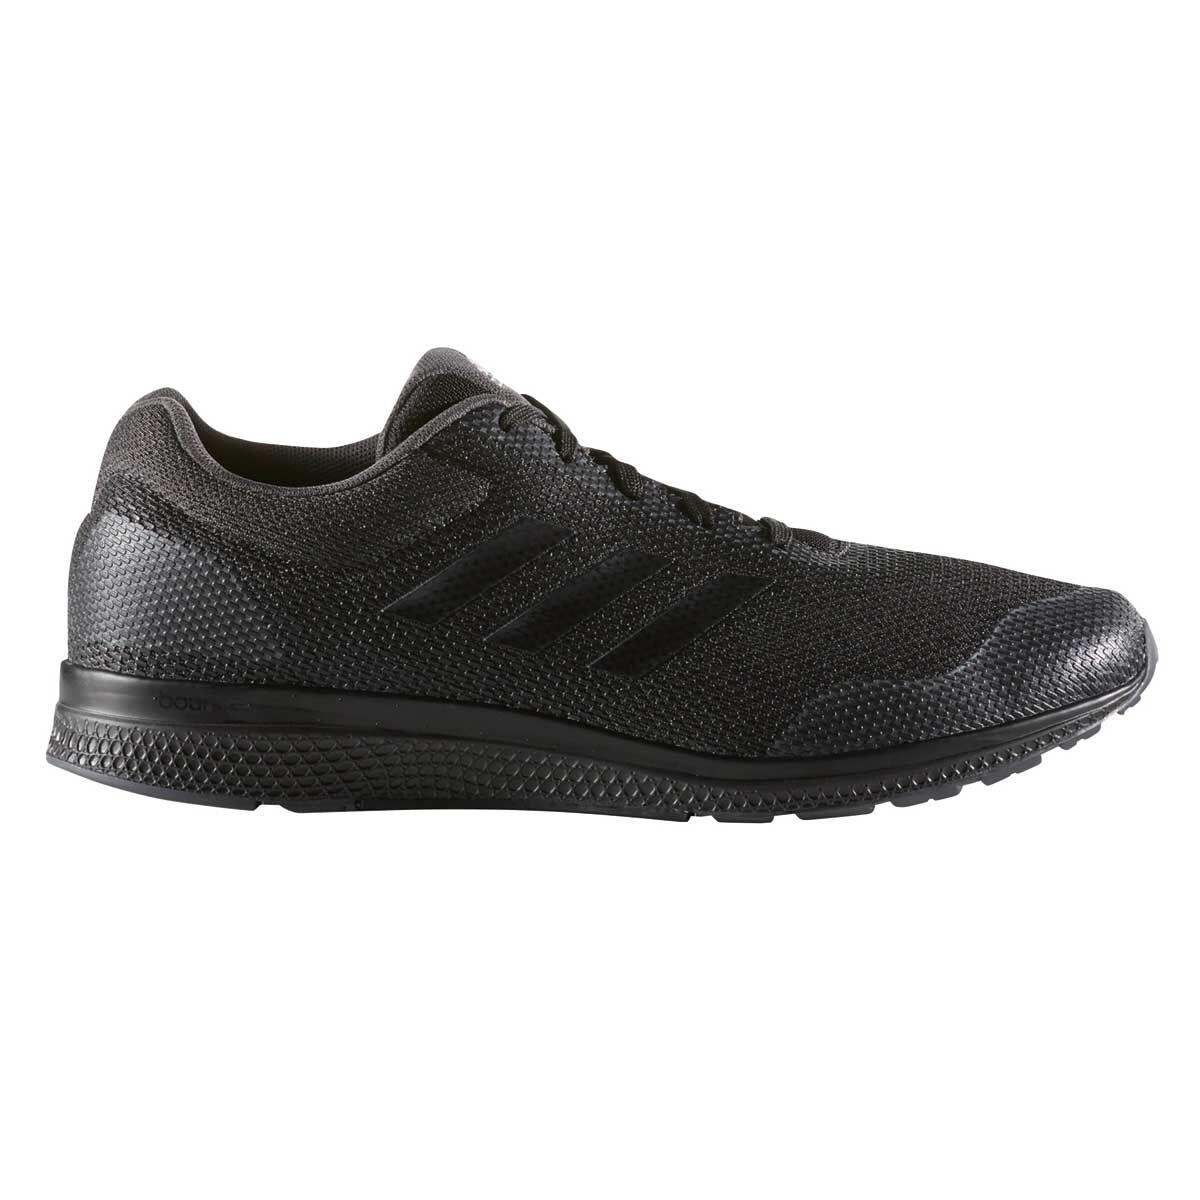 adidas Mana Bounce 2 Mens Running Shoes